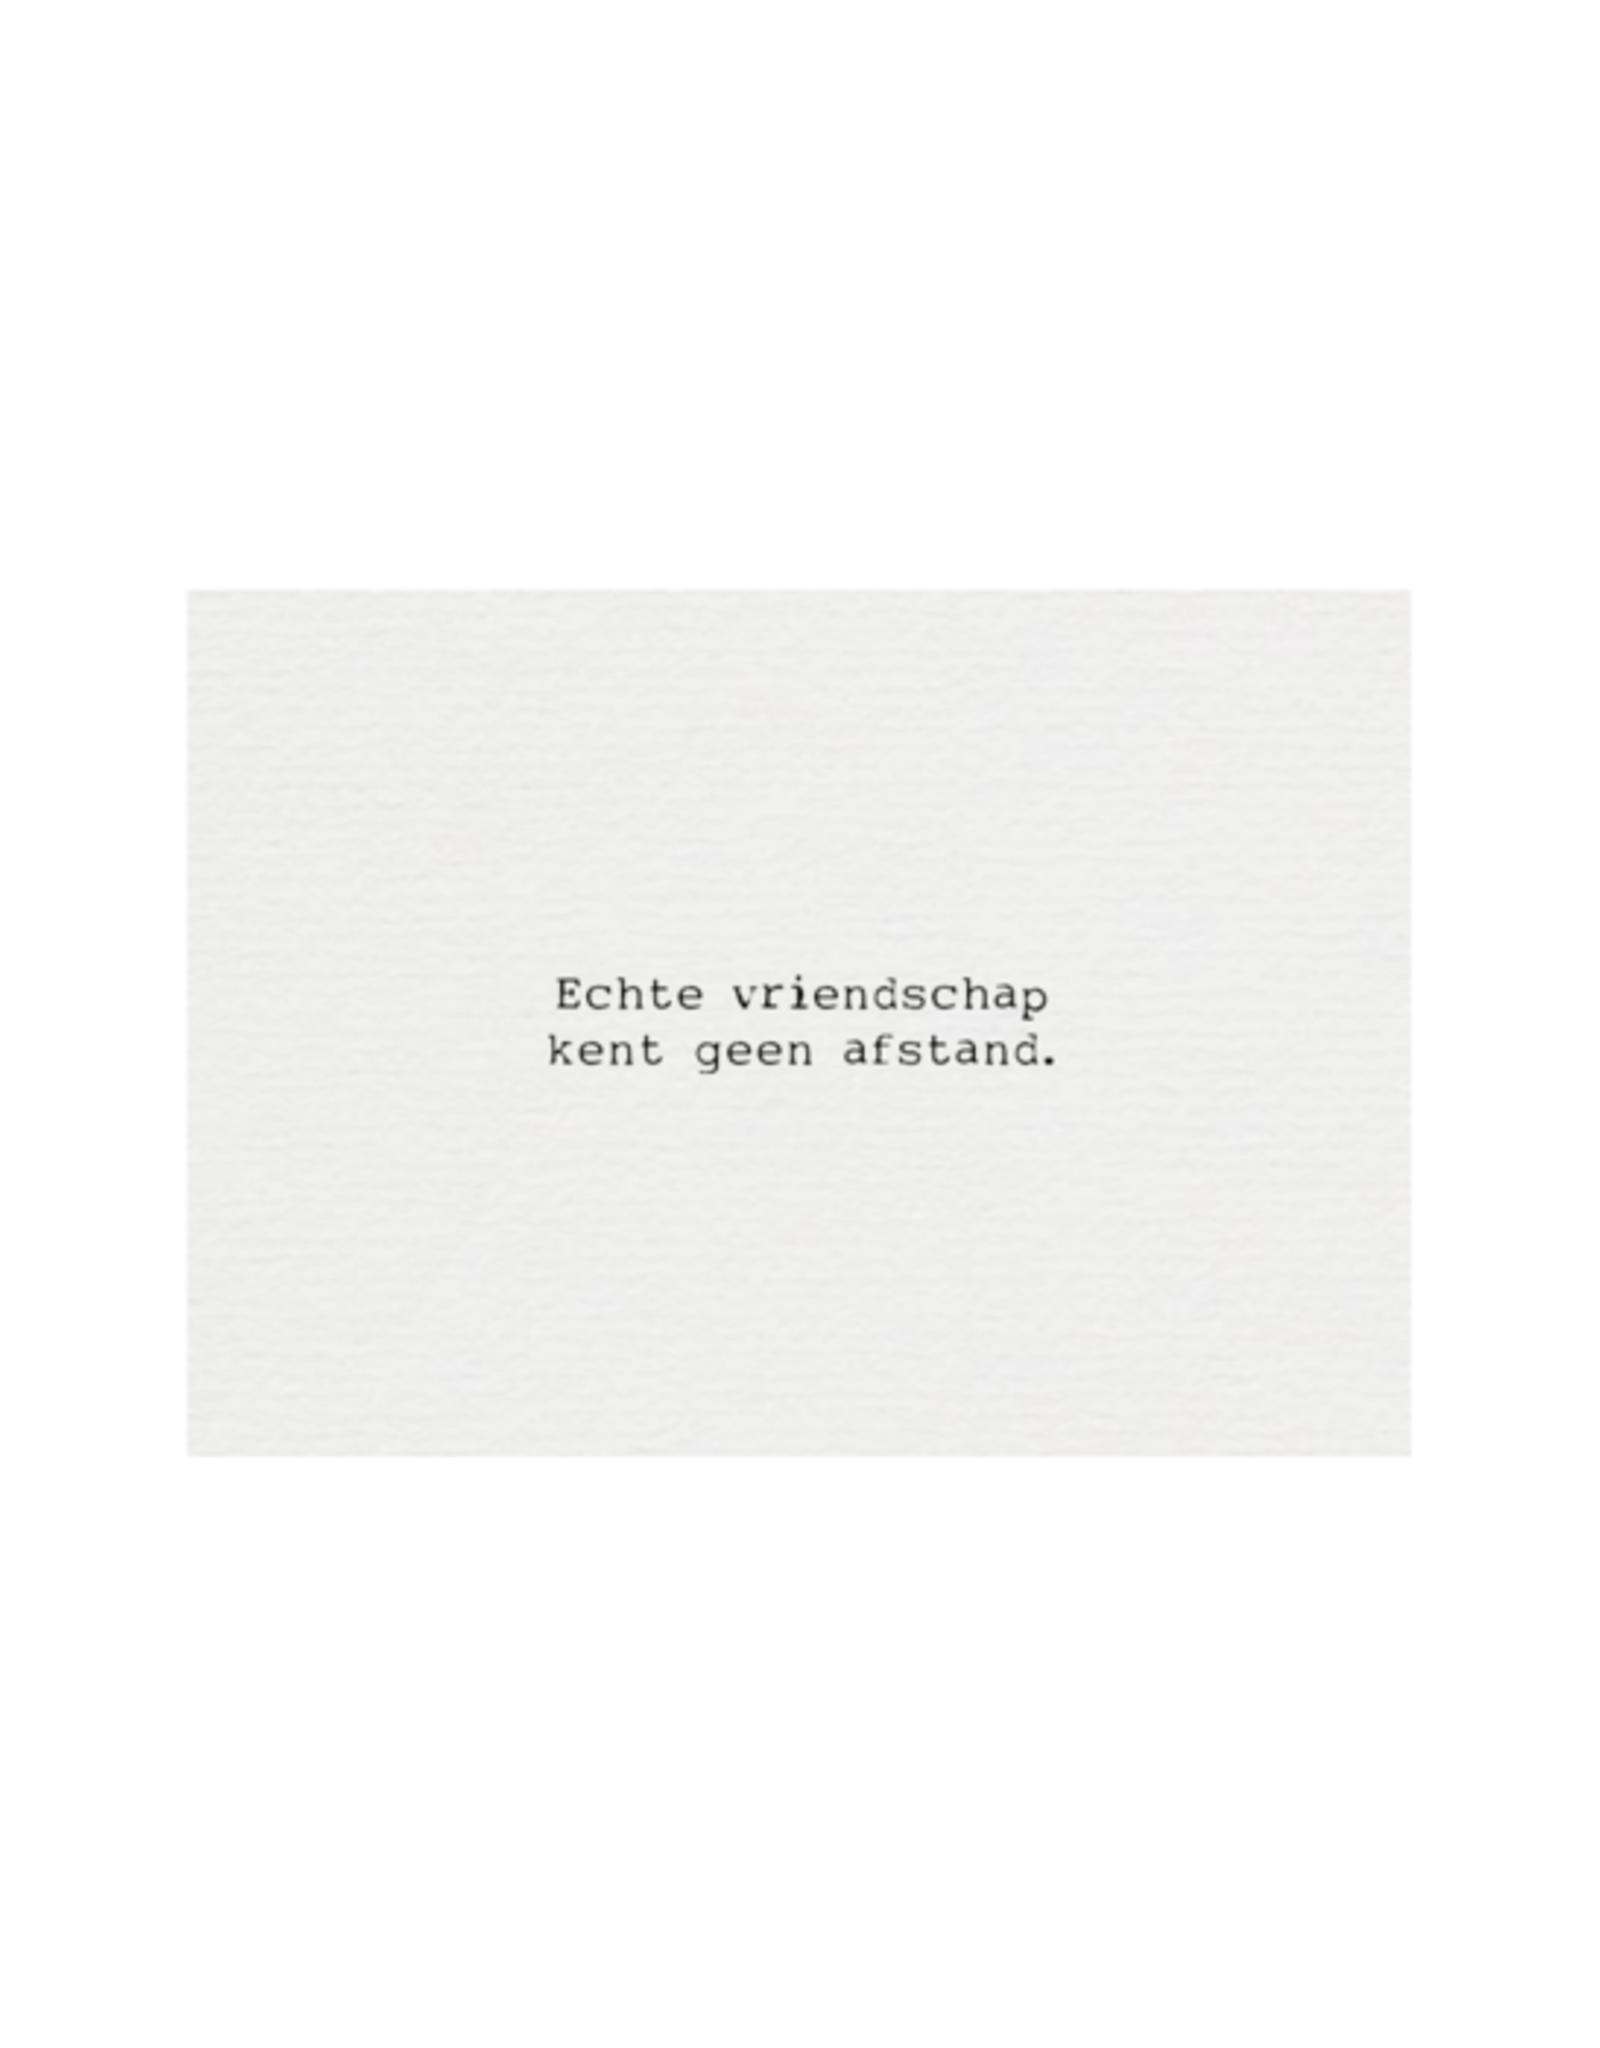 Mousie kaart a6 mousie: echte vriendschap kent geen afstand